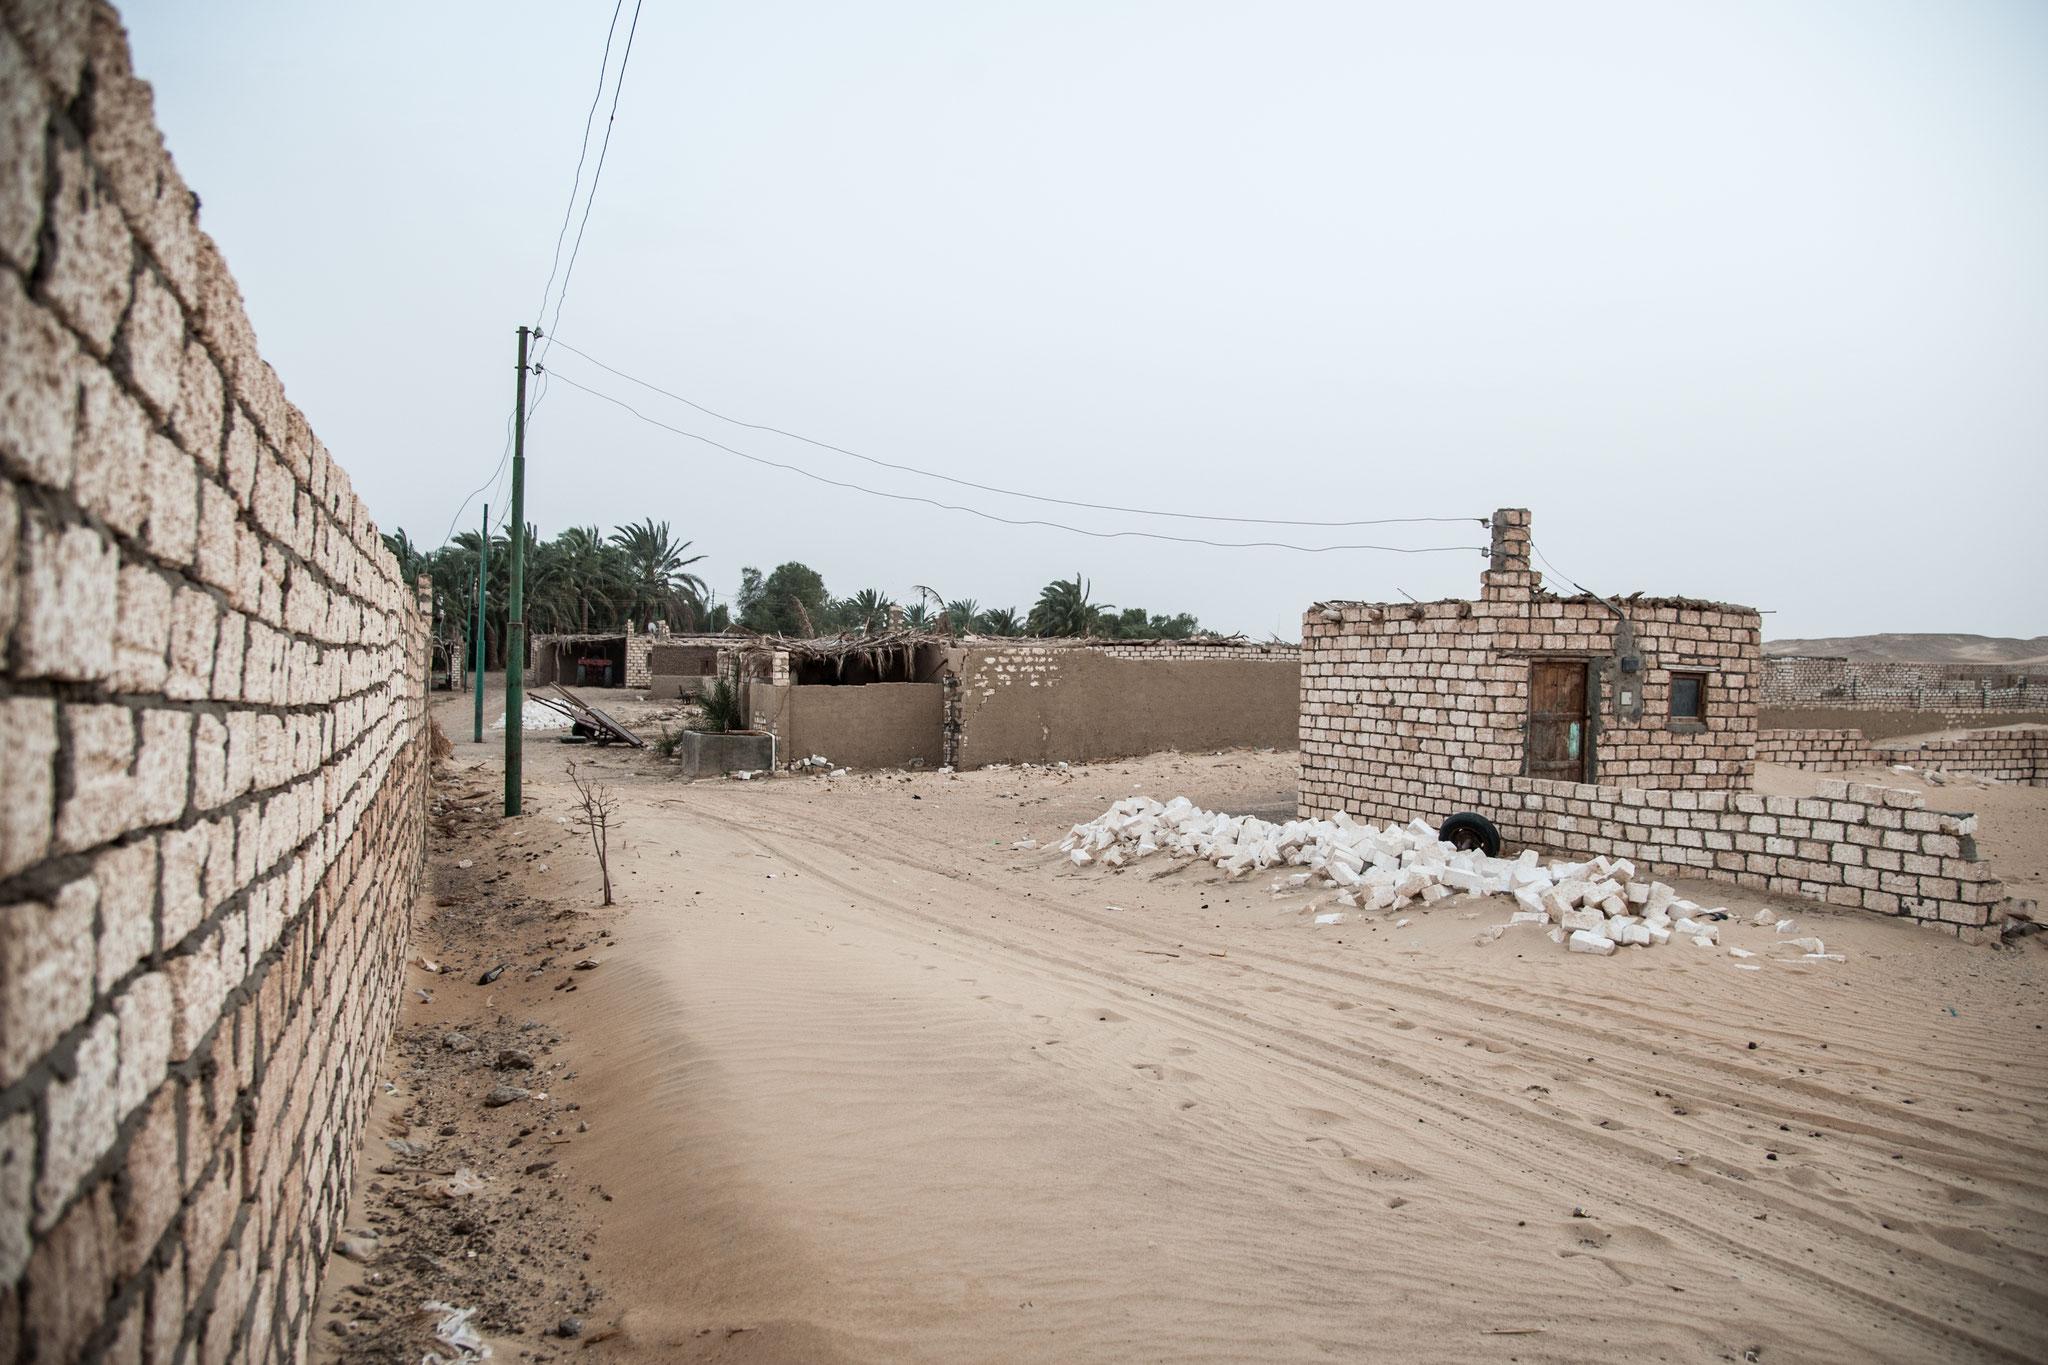 40x60 cm - Egypte